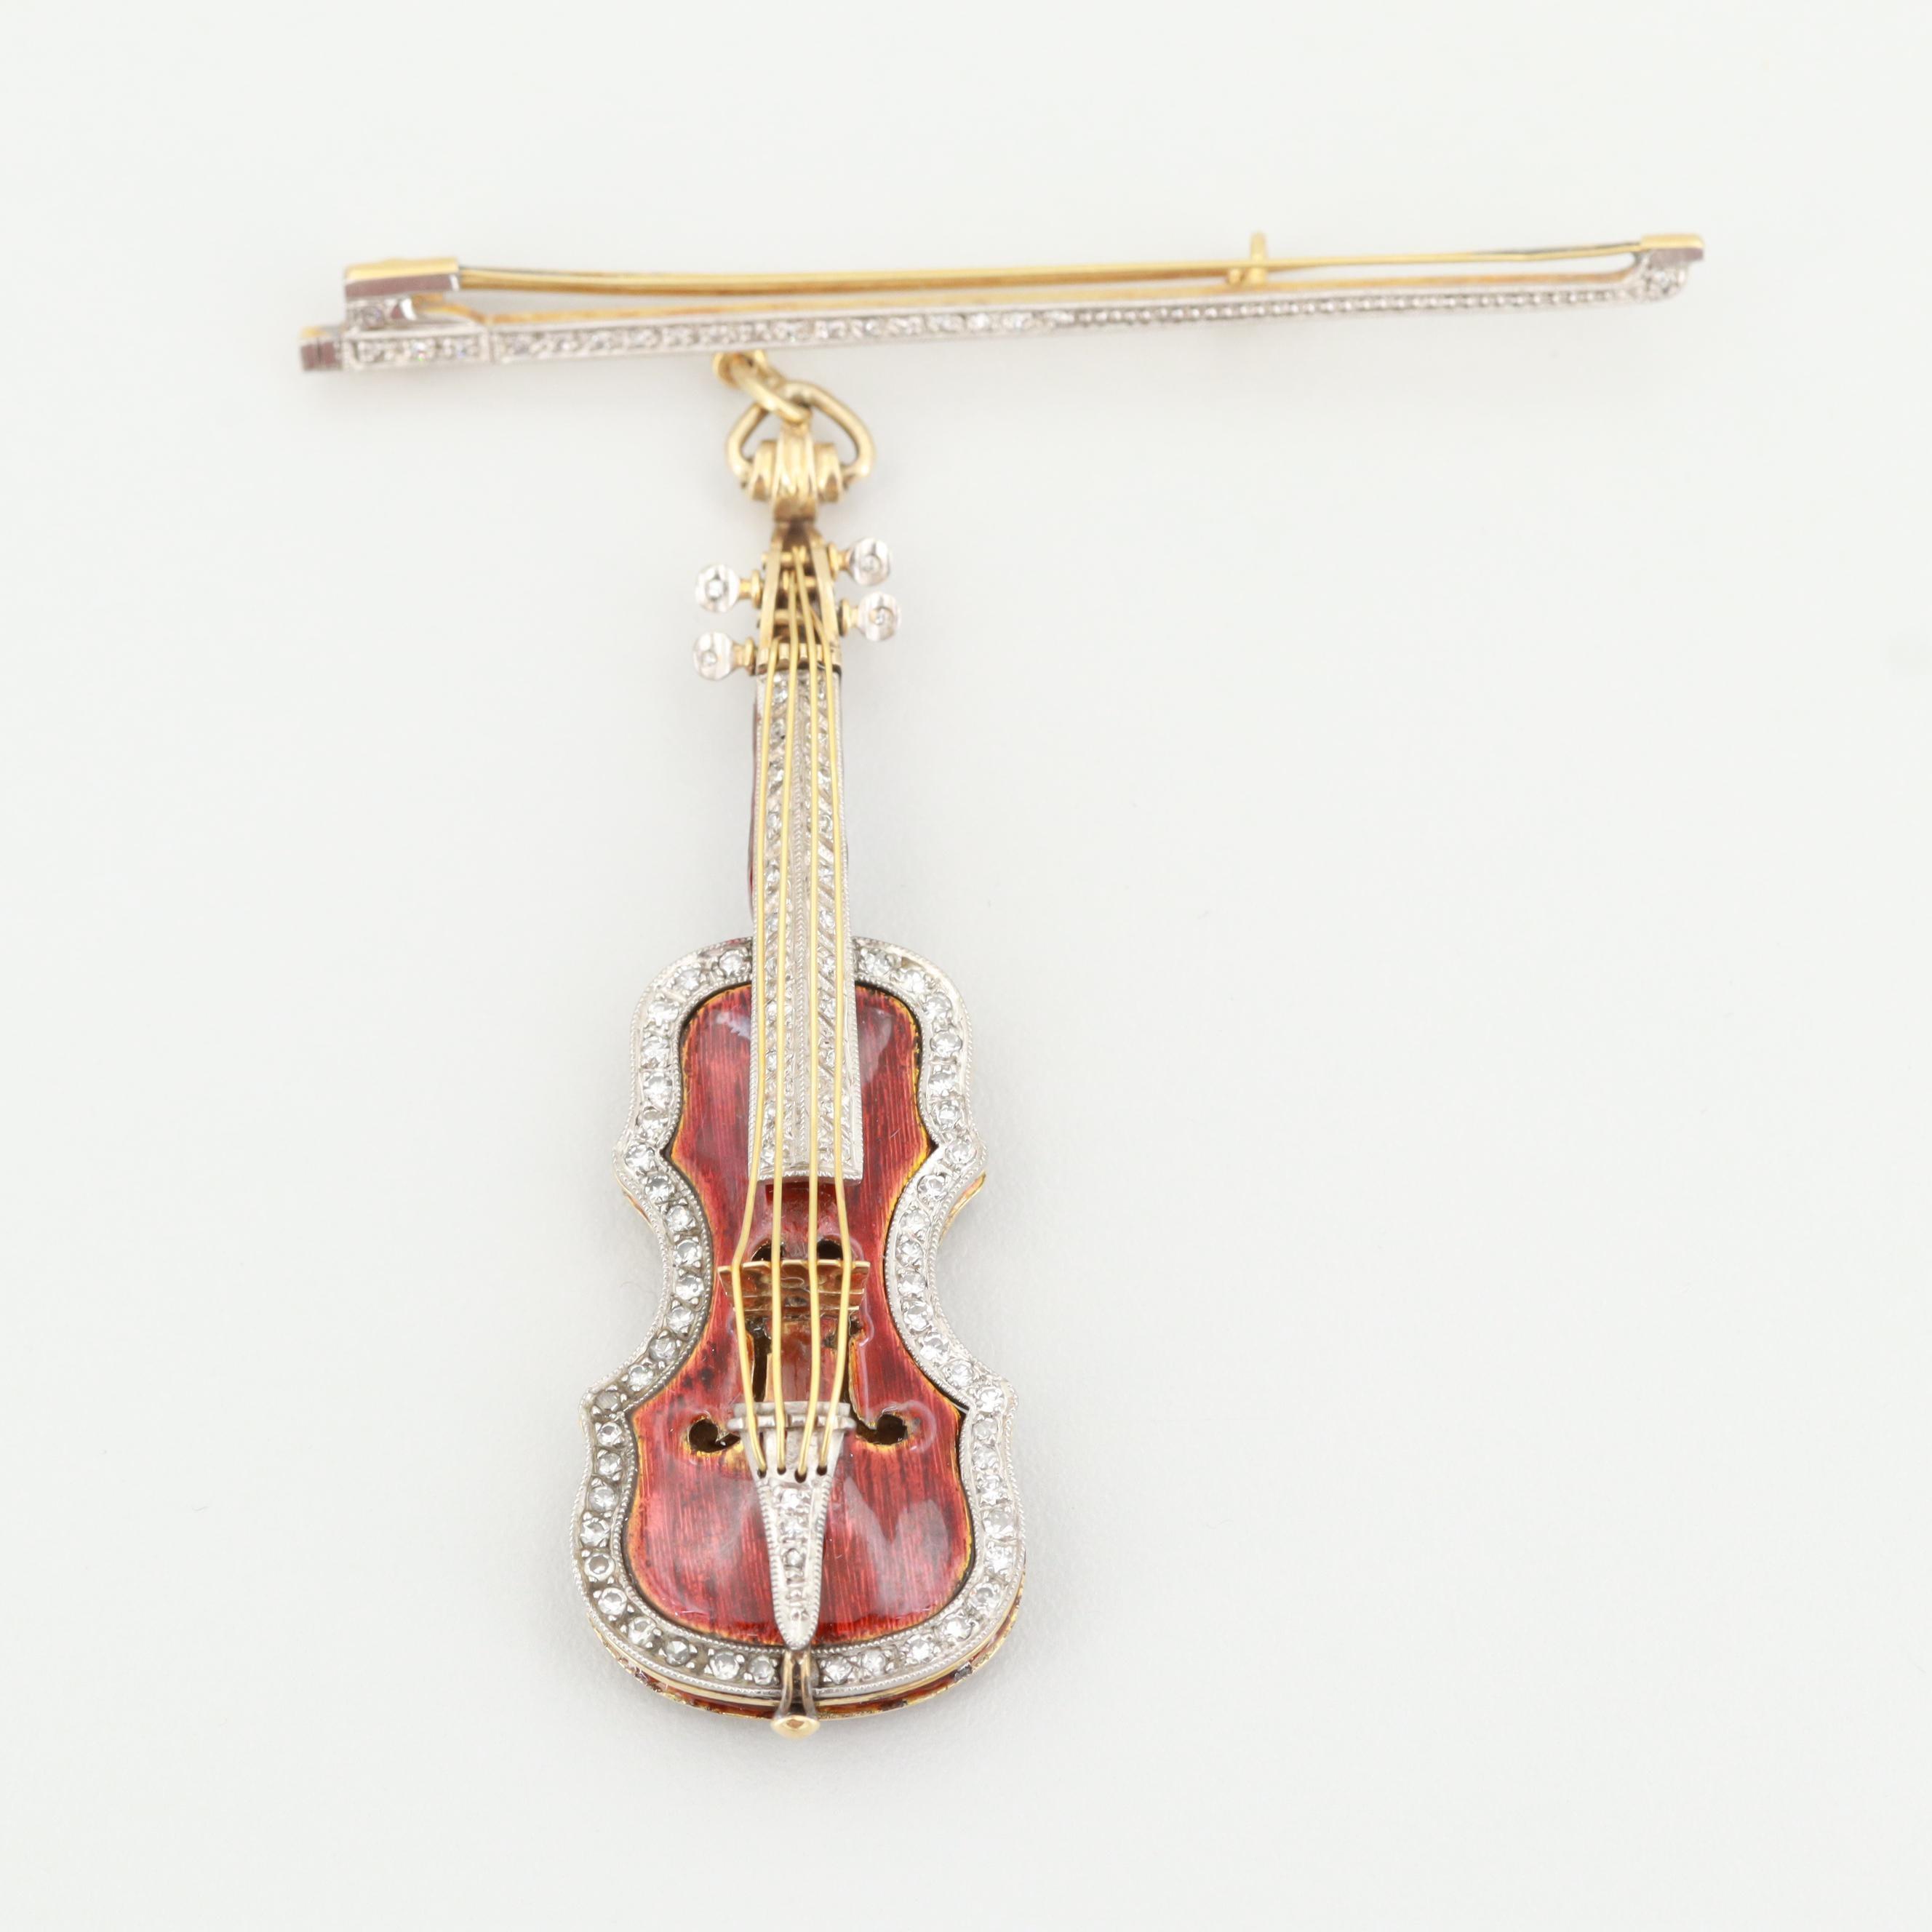 Vintage 18K Yellow Gold Diamond and Enamel Stradivarius Violin and Bow Brooch